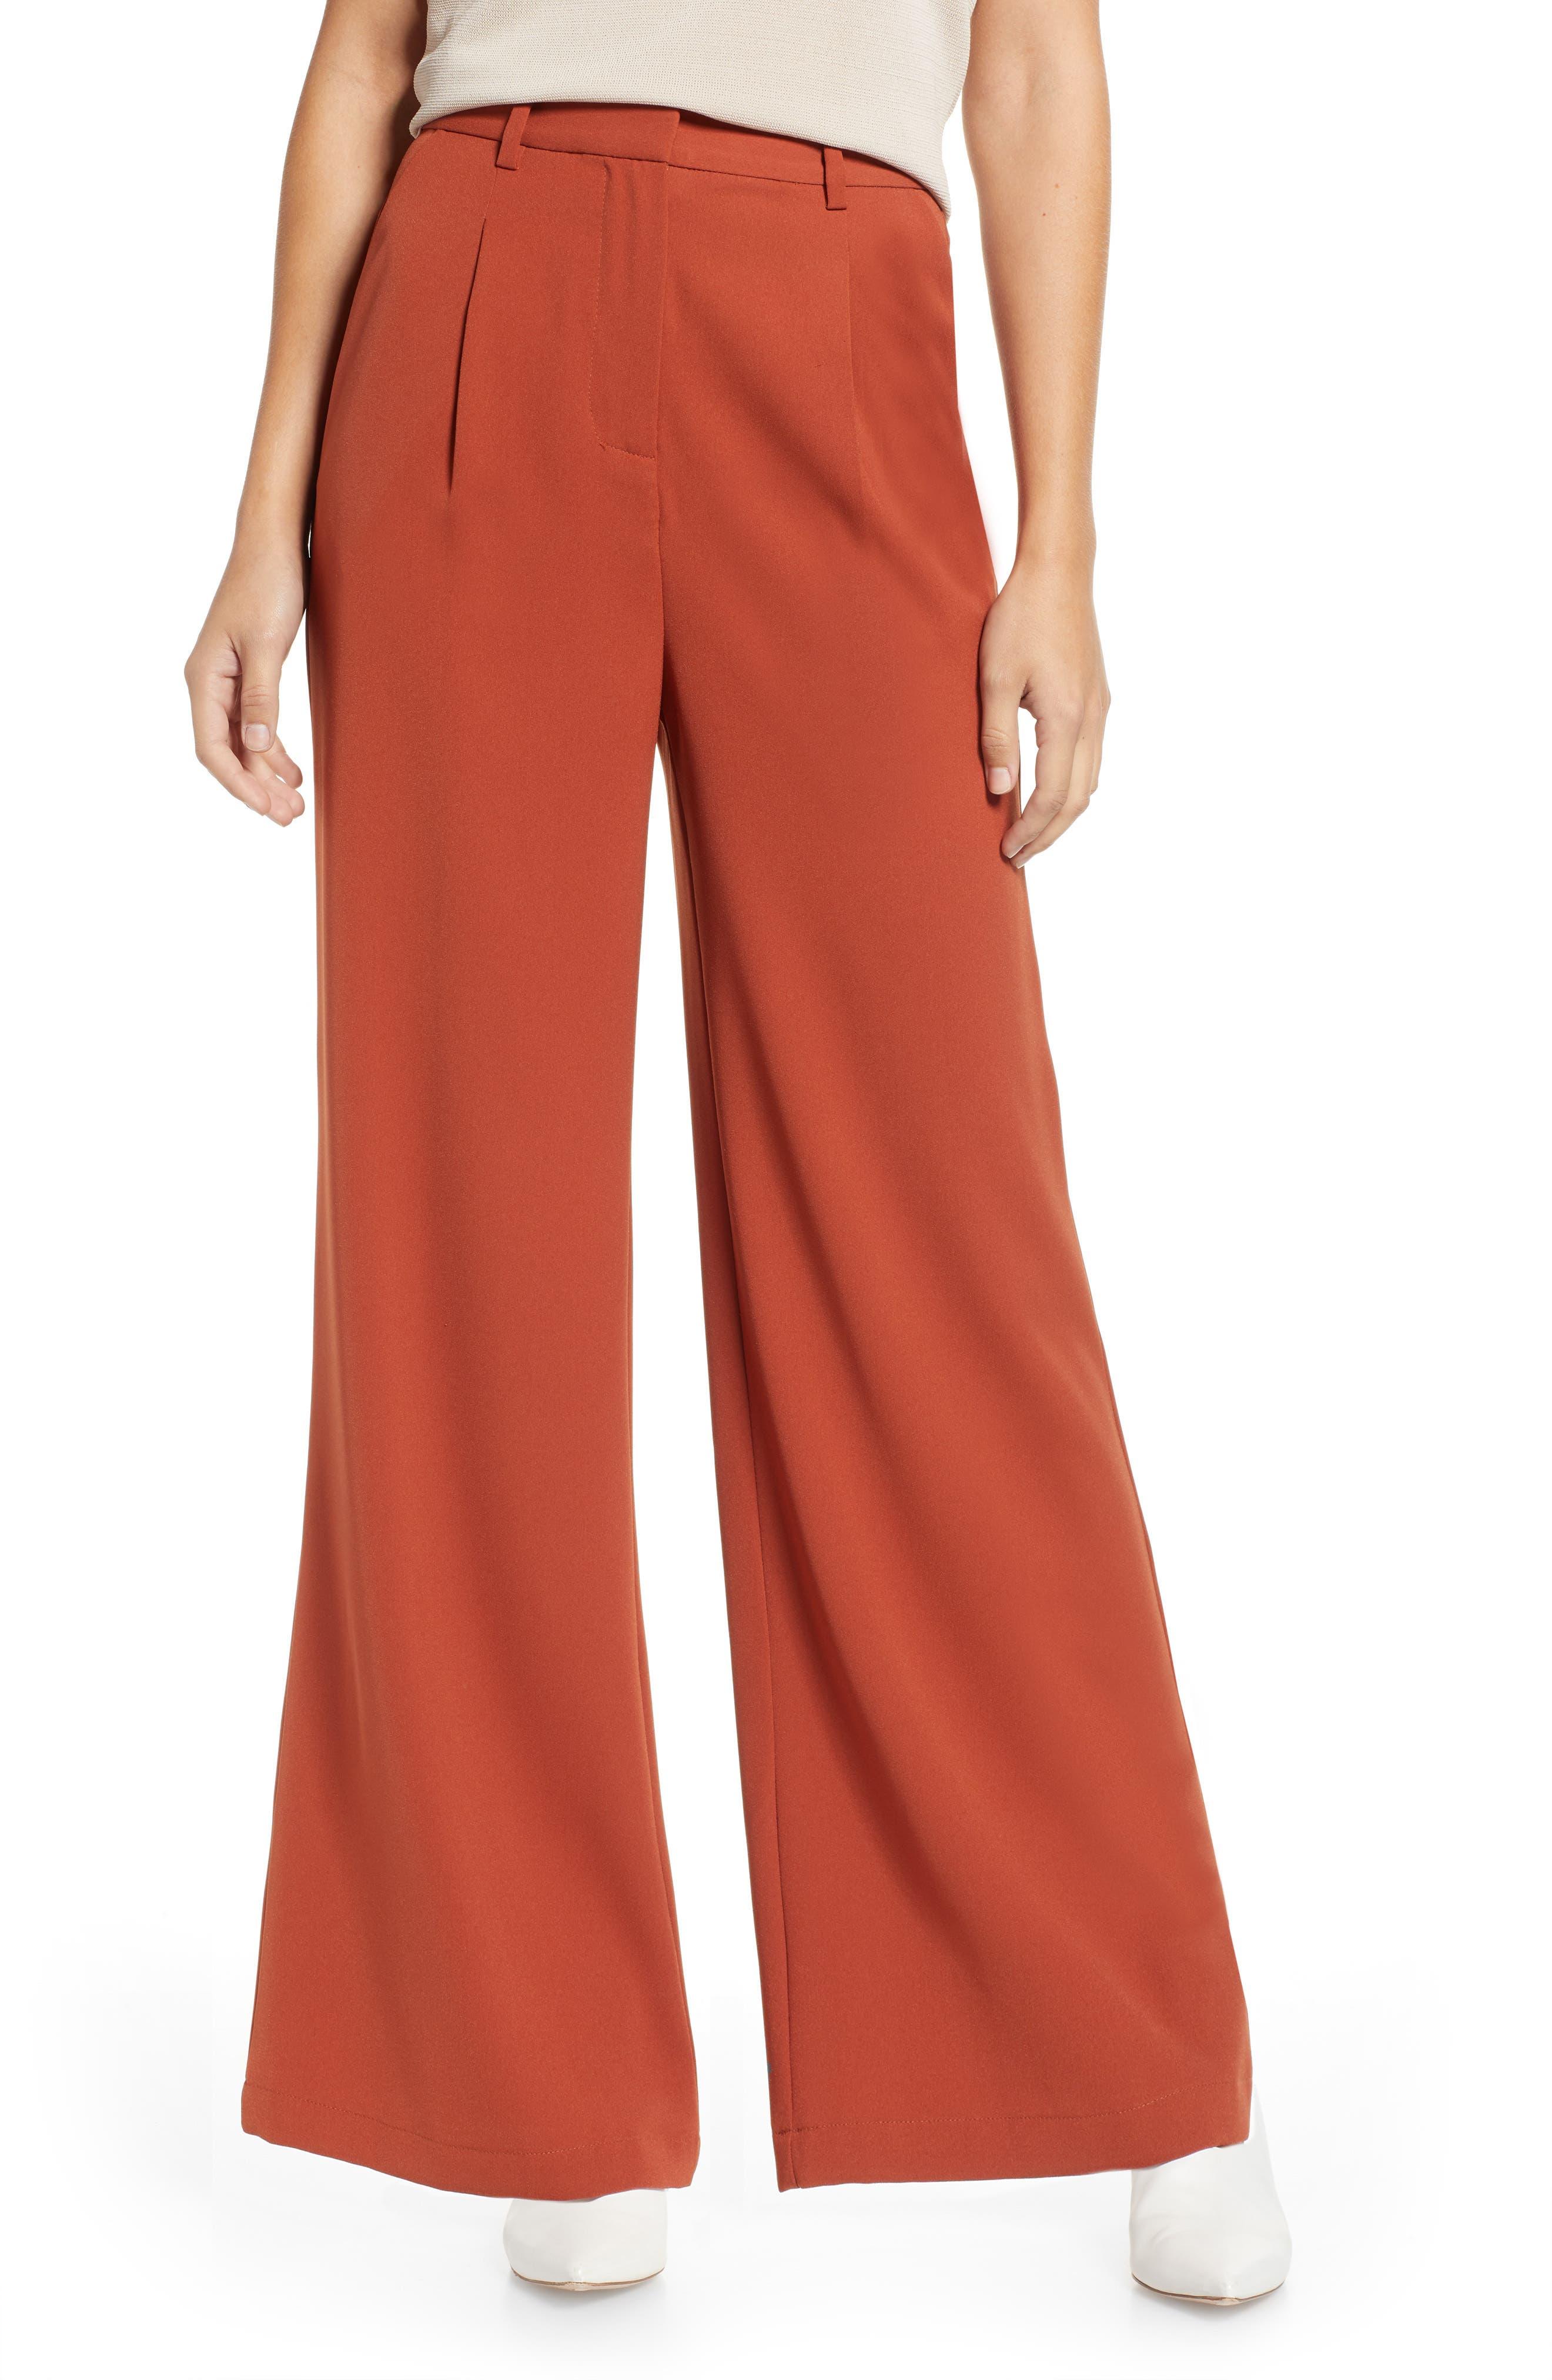 Vintage High Waisted Trousers, Sailor Pants, Jeans Womens Leith High Waist Flare Pants Size Medium - Brown $27.60 AT vintagedancer.com